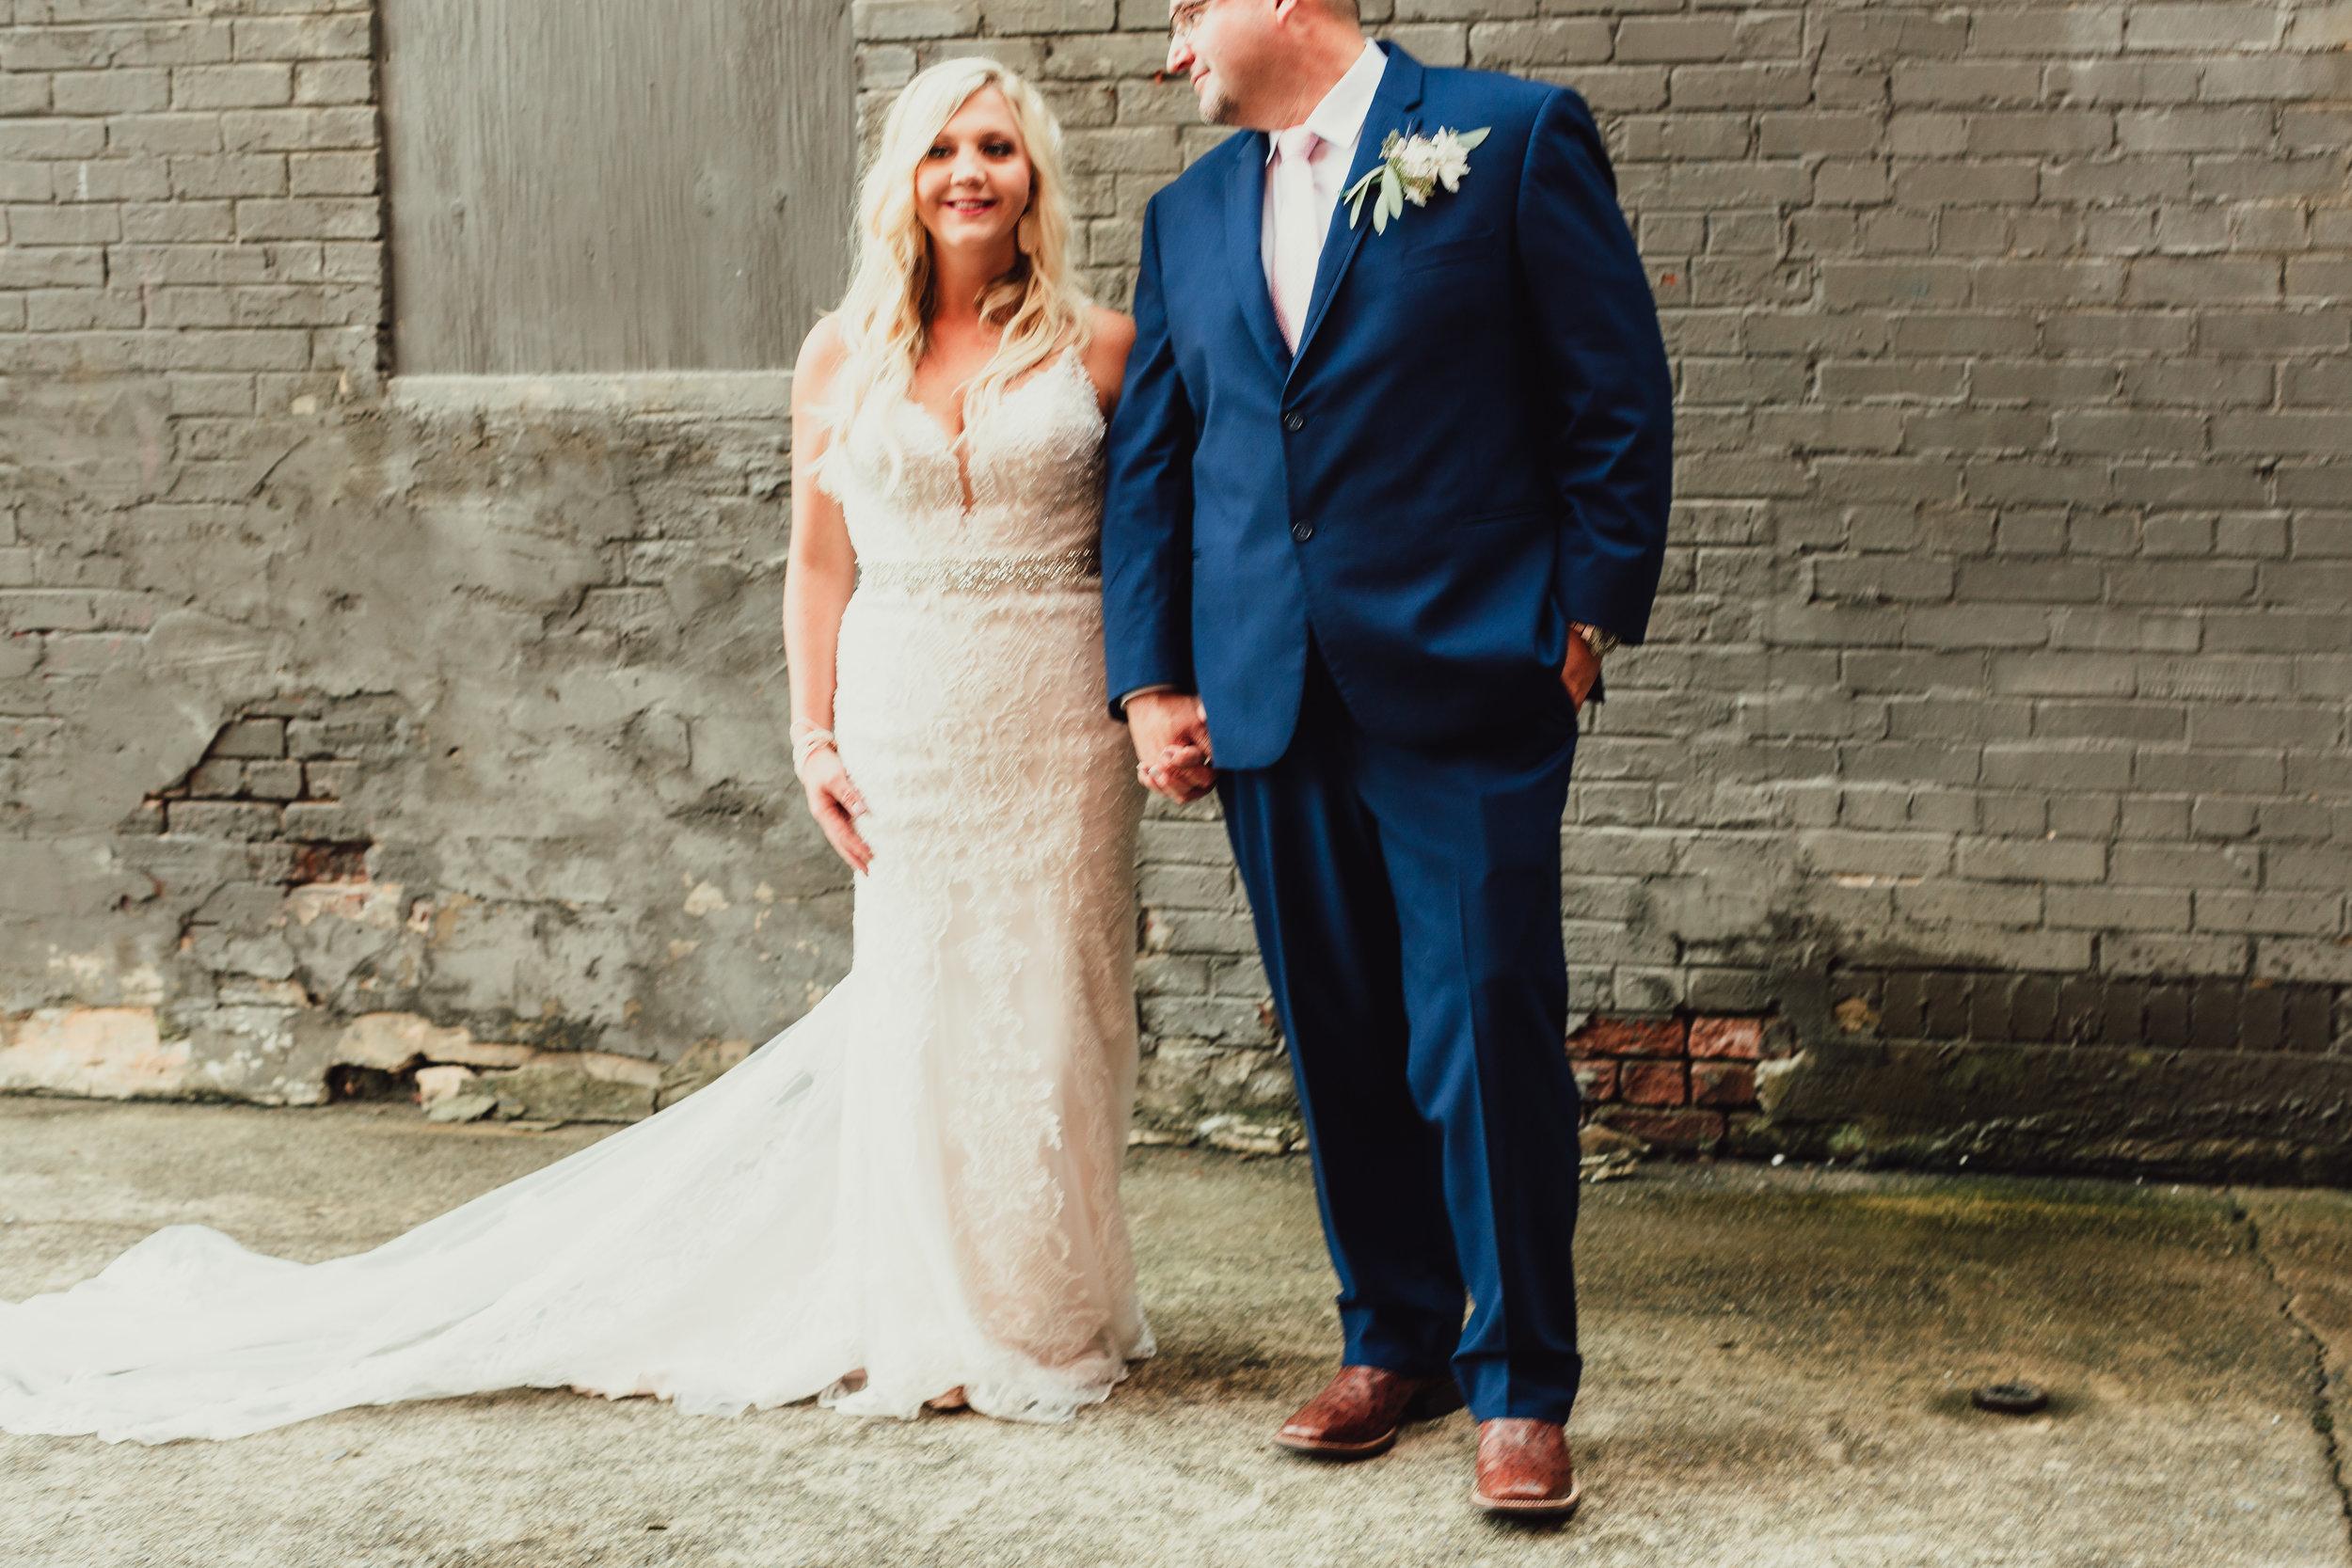 east-tn-wedding-photographer-tennessee-elopement-photographer-kingsport-tn-wedding-photographer (706 of 1001).jpg